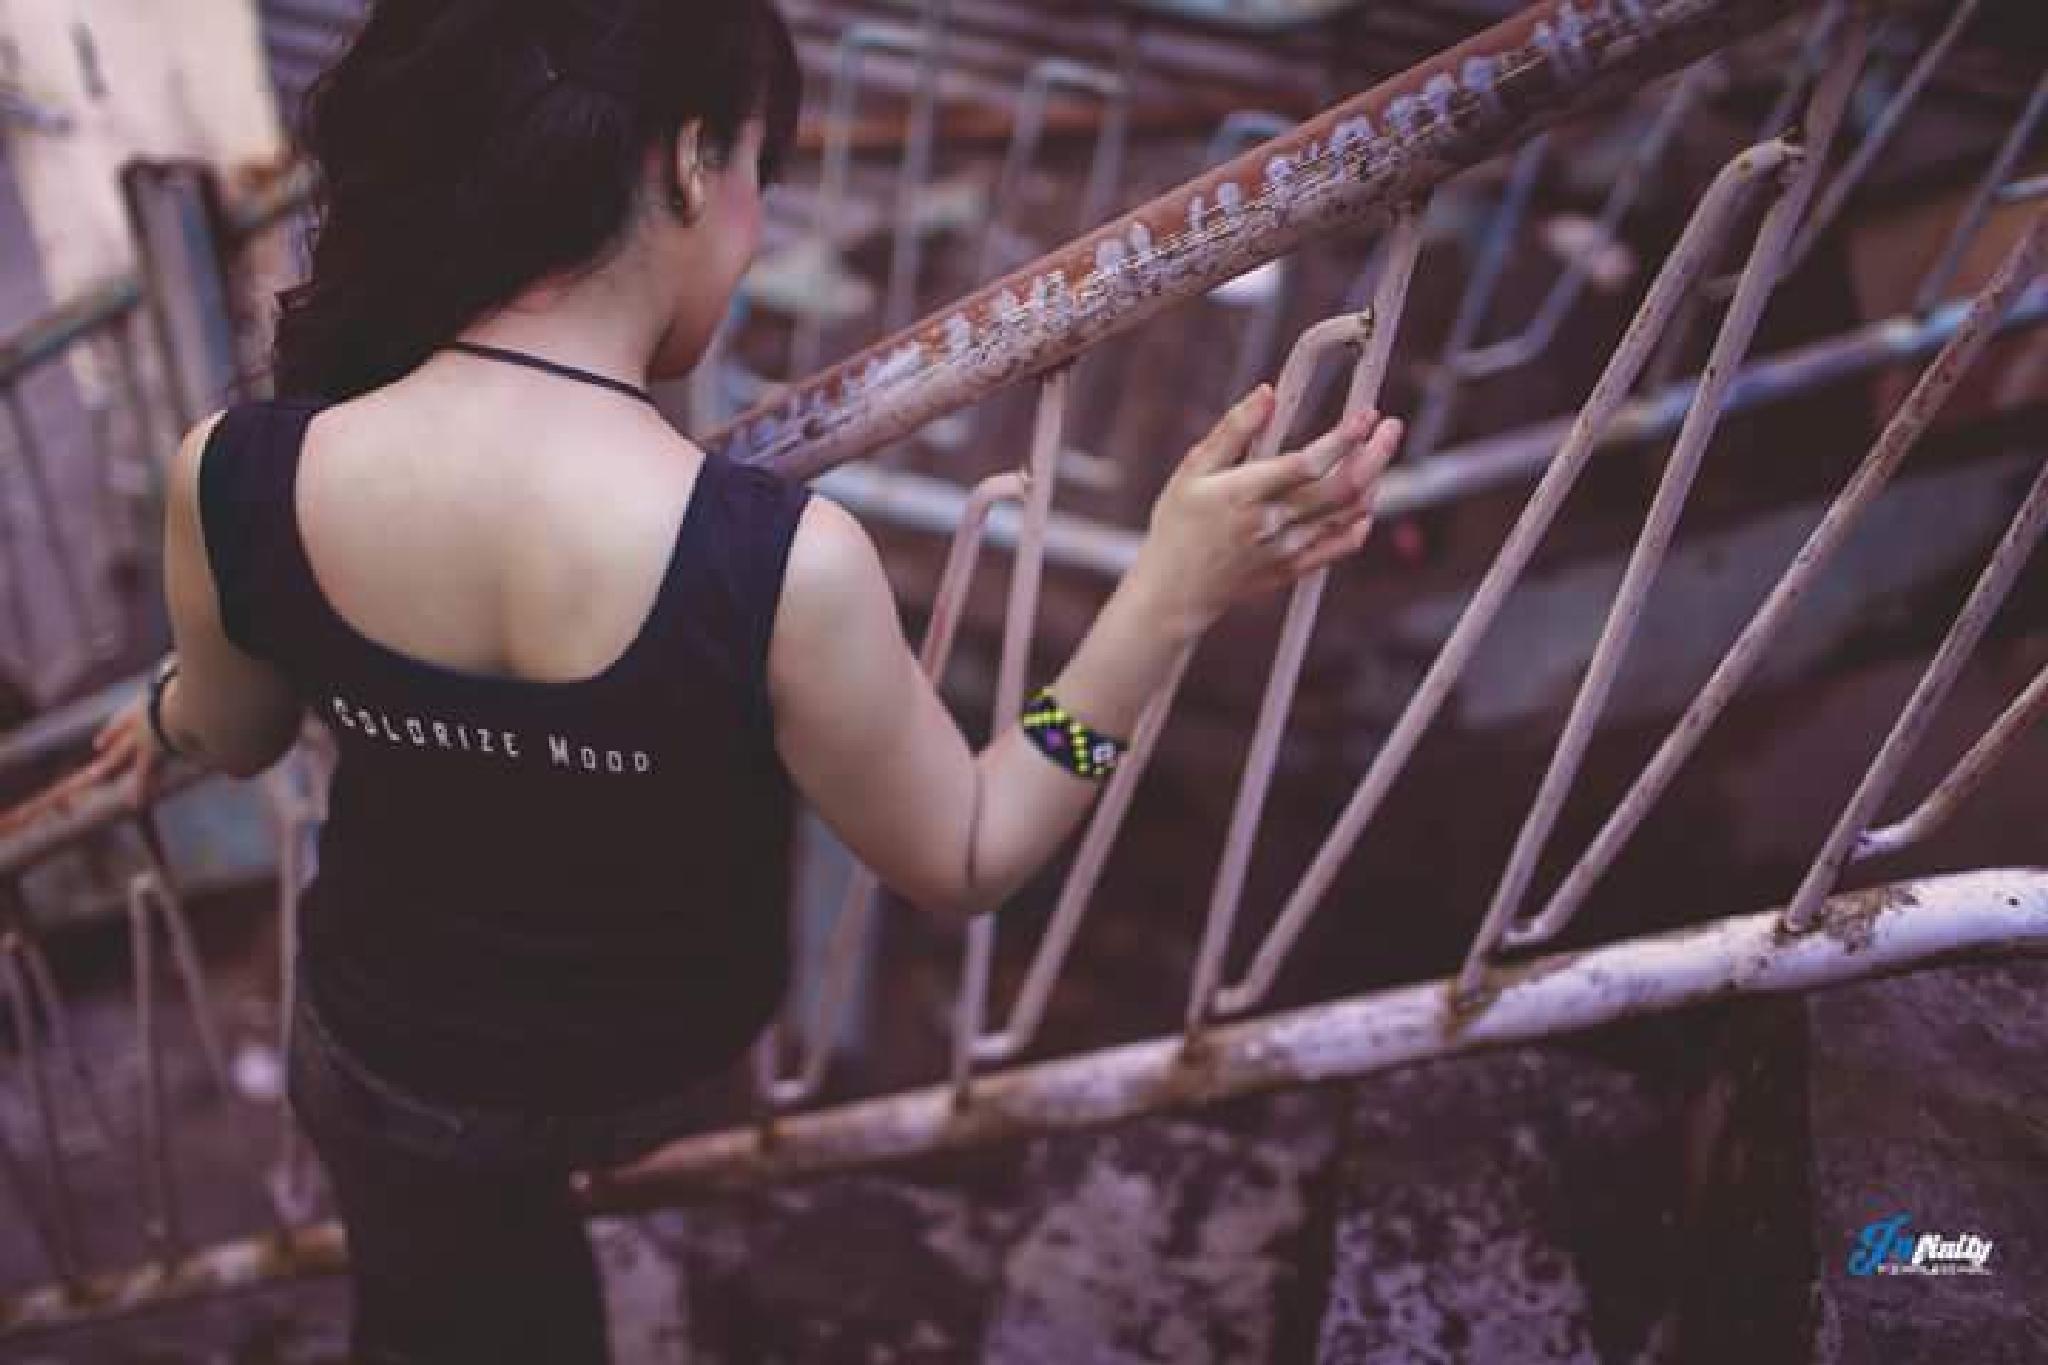 #theabr #colorizemood #streetphotography #malaysia #borneo by zura